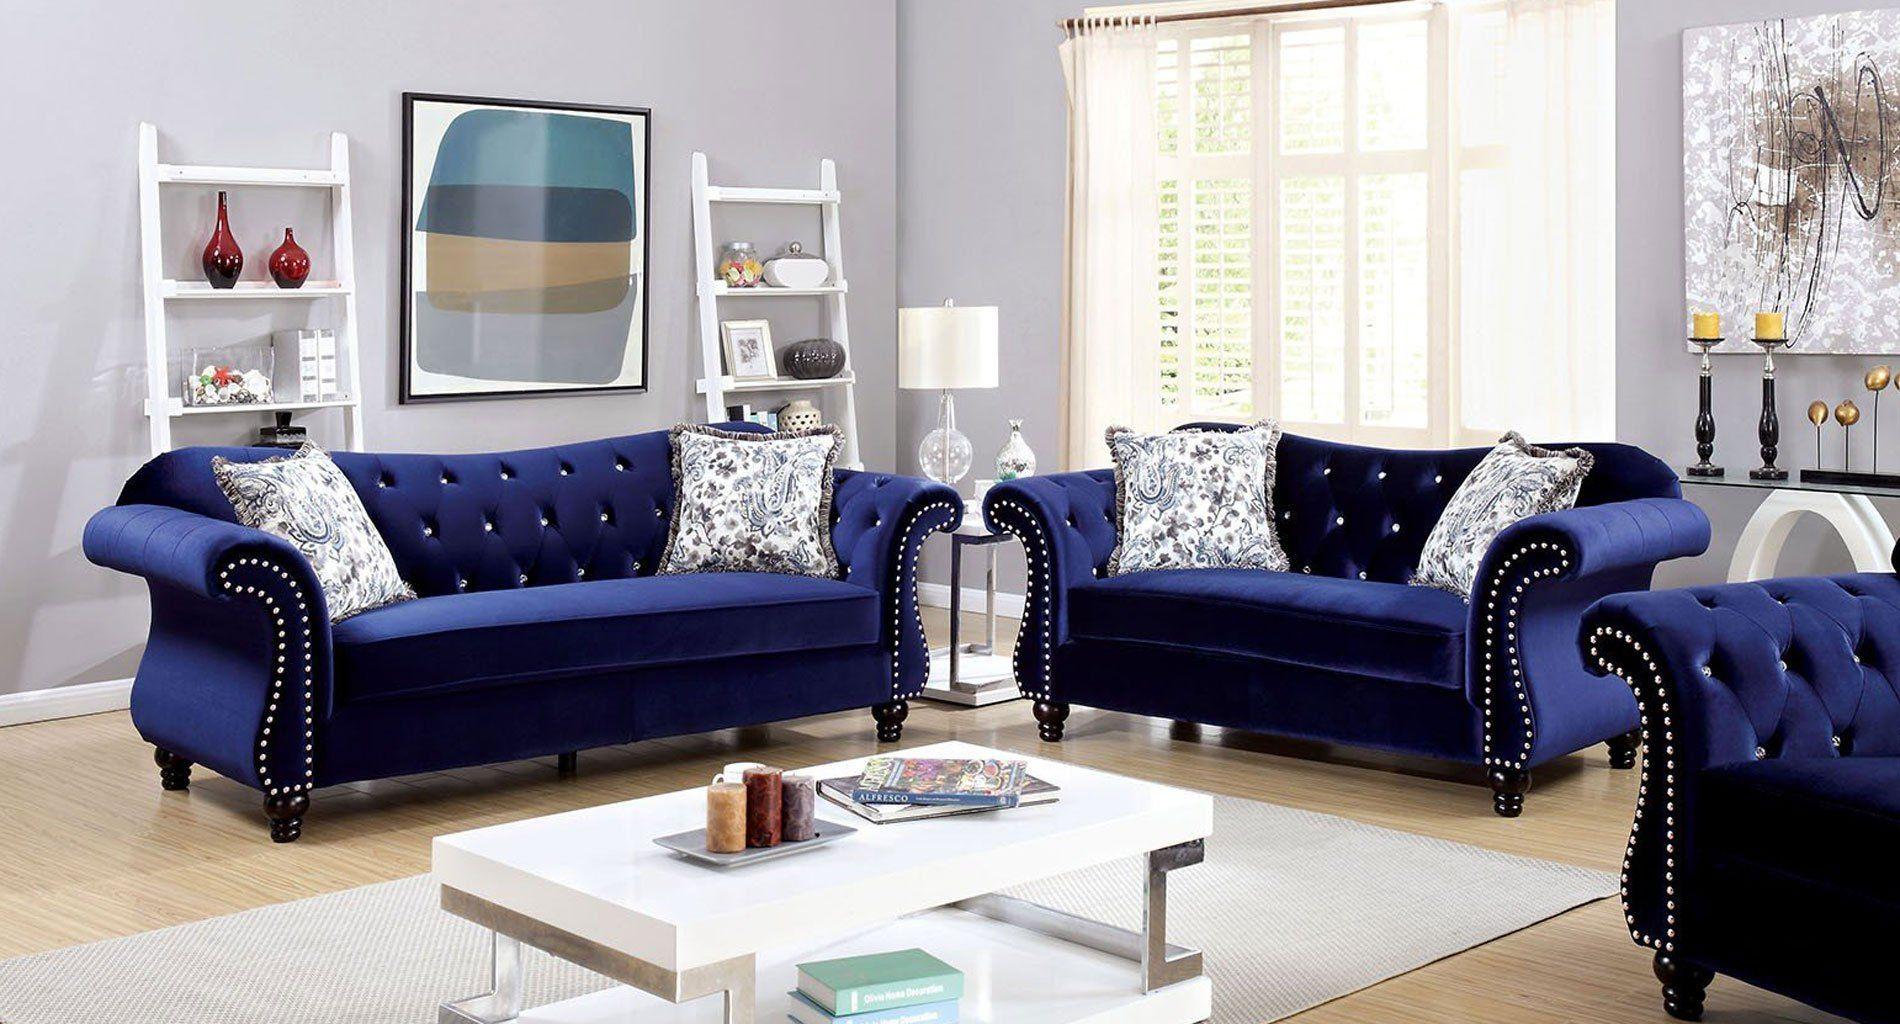 Jolanda Living Room Set (Blue) | Blue Living Room Decor Throughout Blue Sofa Chairs (View 8 of 15)